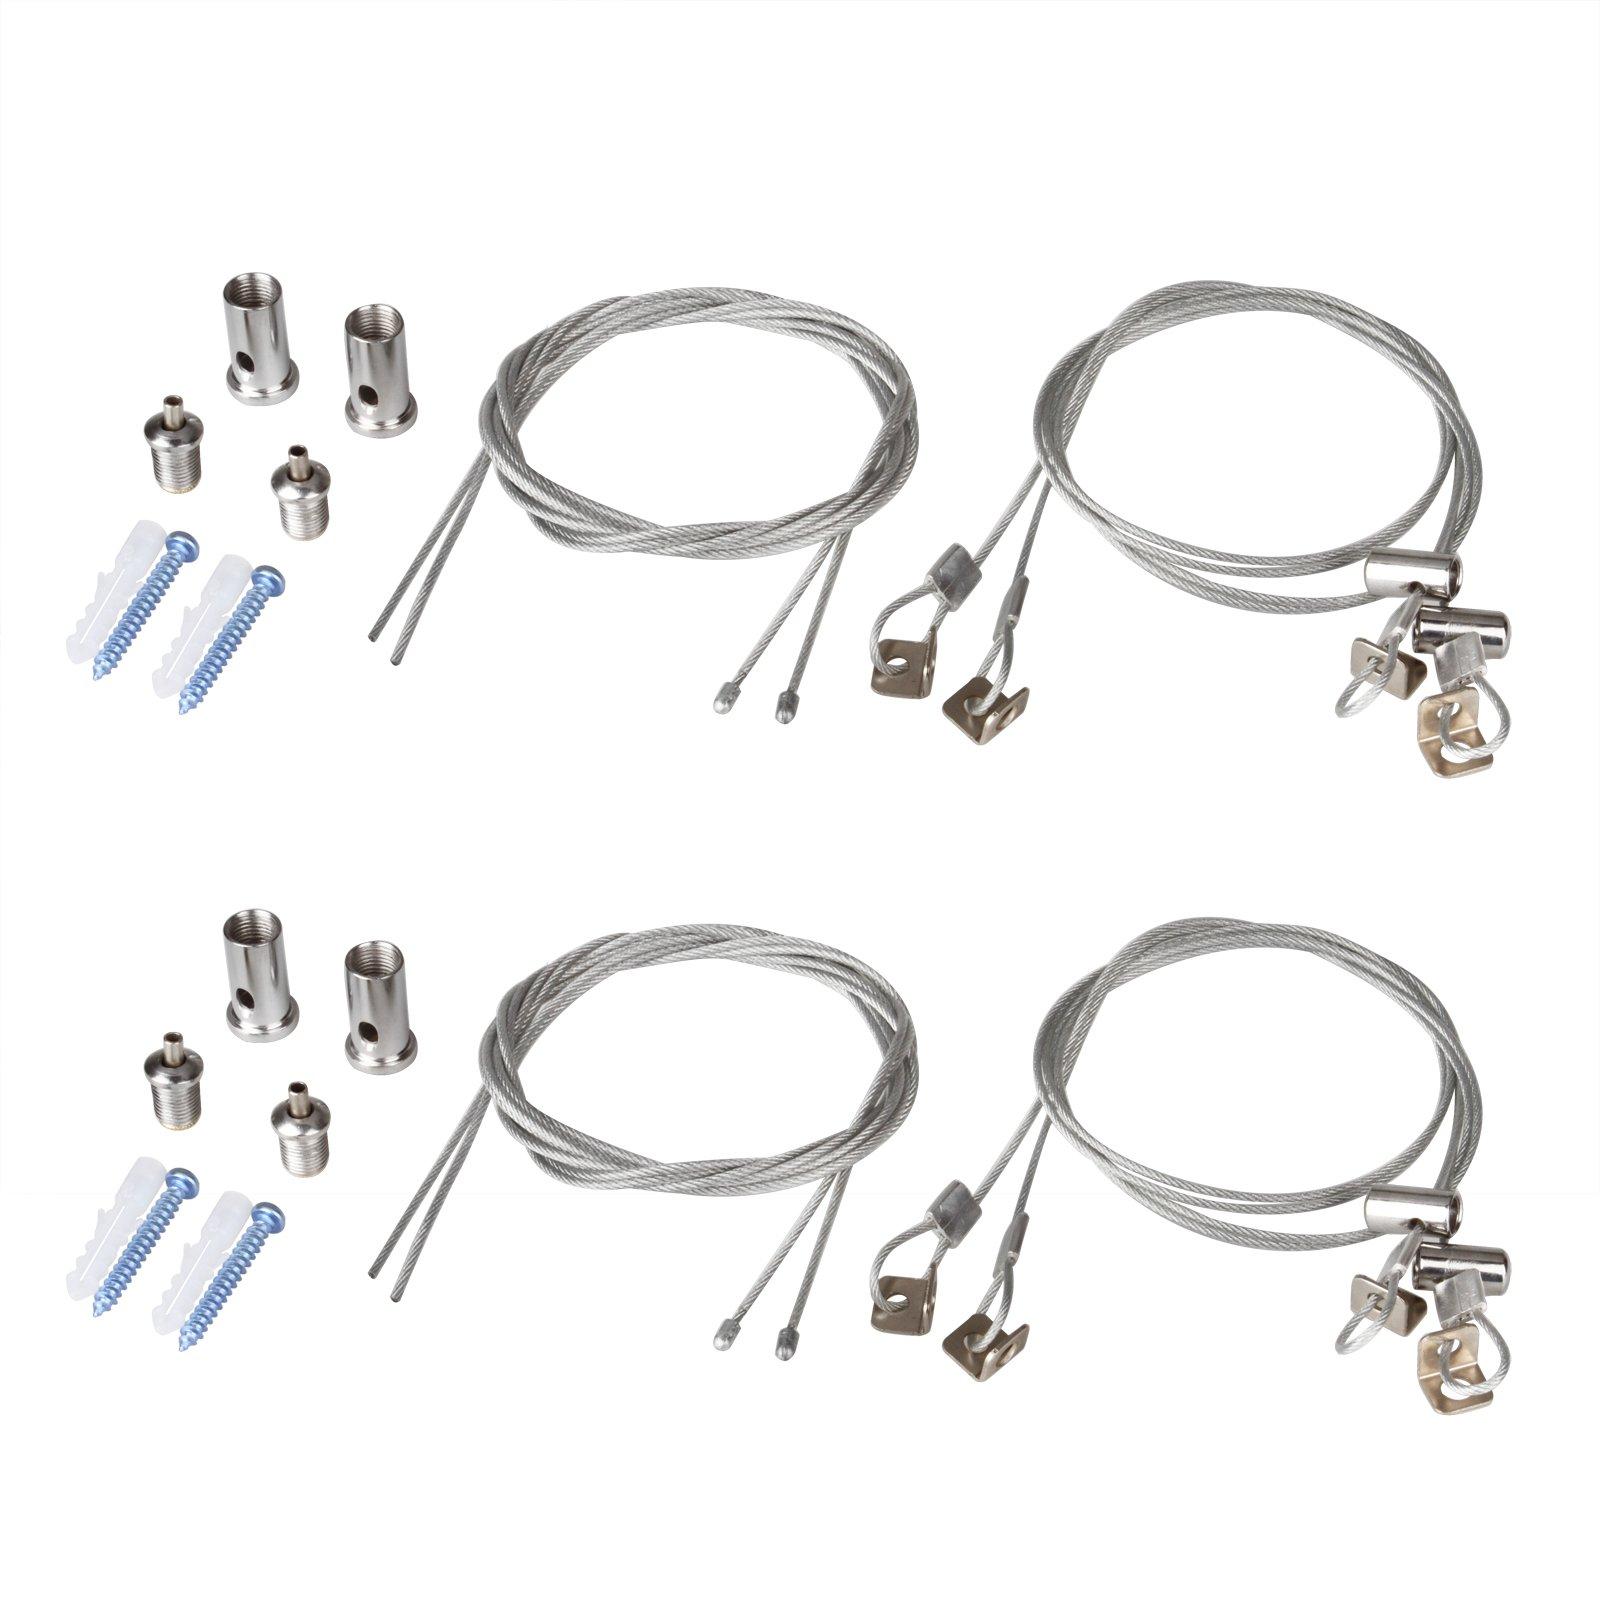 OTTFF 2Set/8pcs Lights Suspension Kit Luminaire Installation Hardware Adjustable Fastener - 3.2ft Iron Cable can Trimmed Length - Load 3KG Per Strip for Aquarium Lights LED Panel Light(2 Sets)